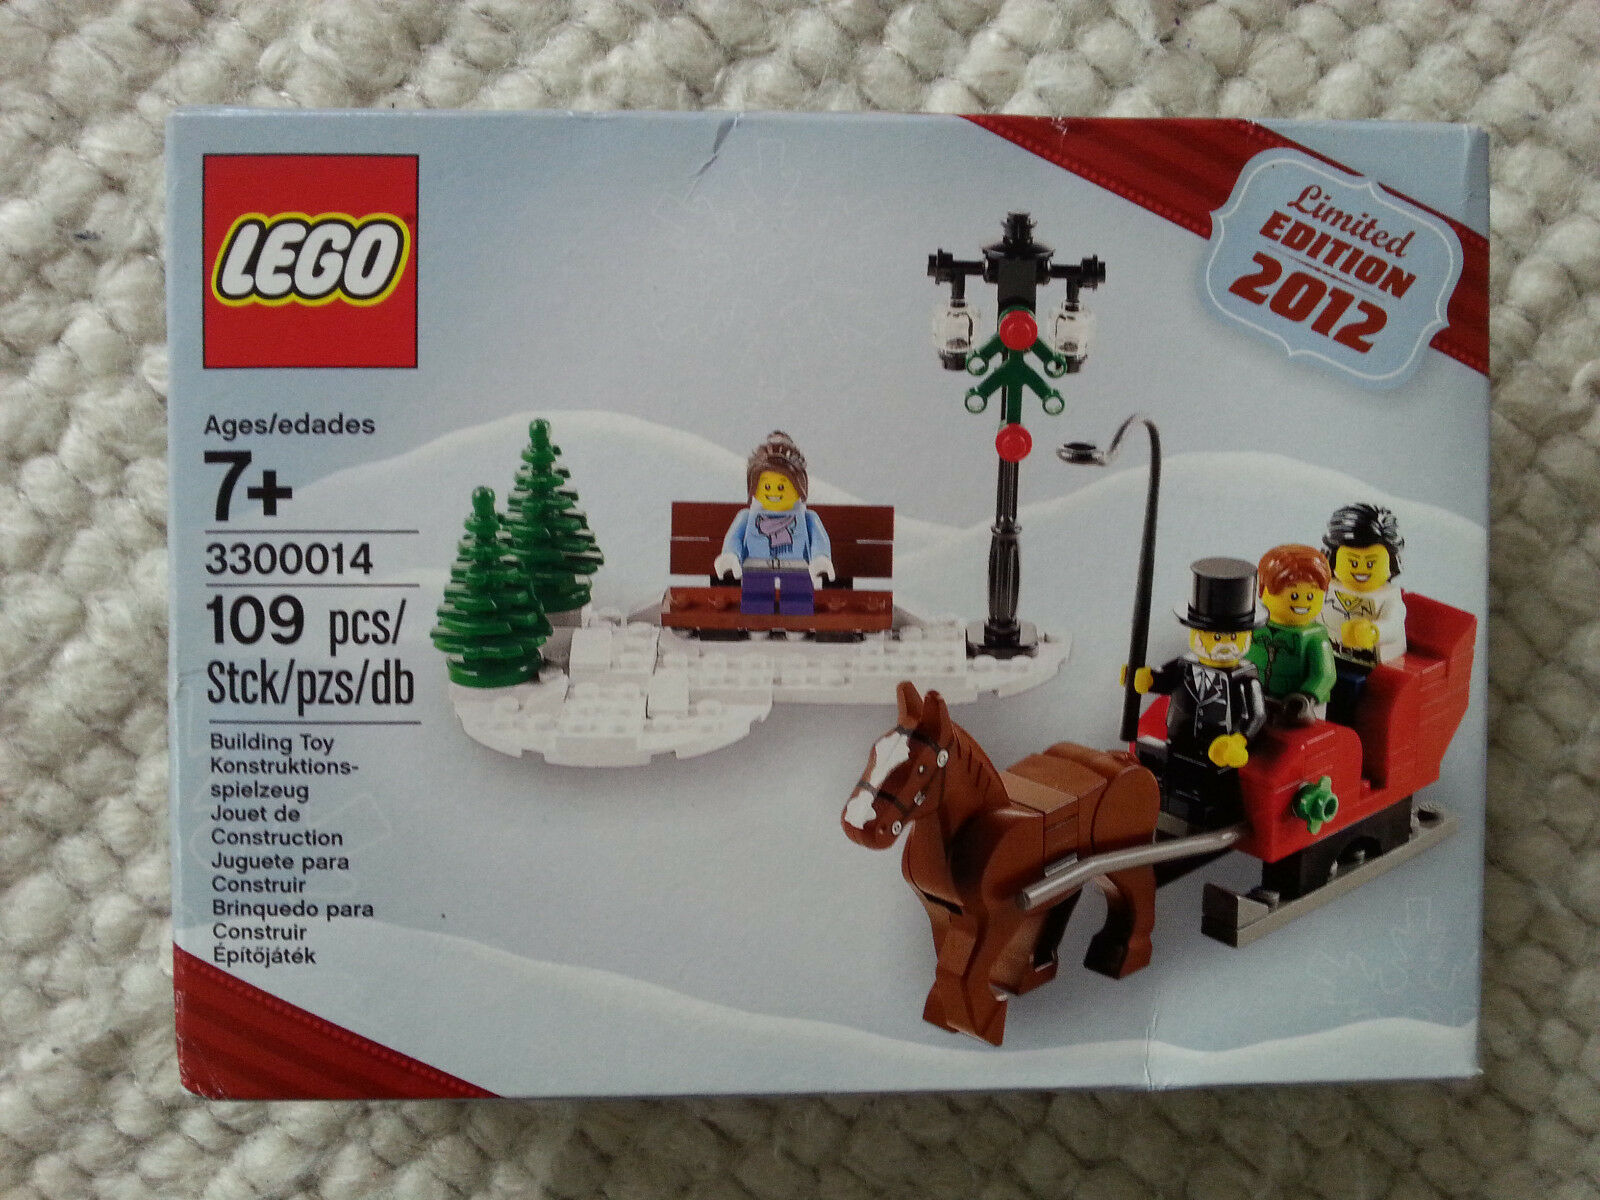 LEGO LEGO LEGO Creator 3300014 Winterliche Kutsche LIMITED EDITION 2012 NEU OVP defbc7